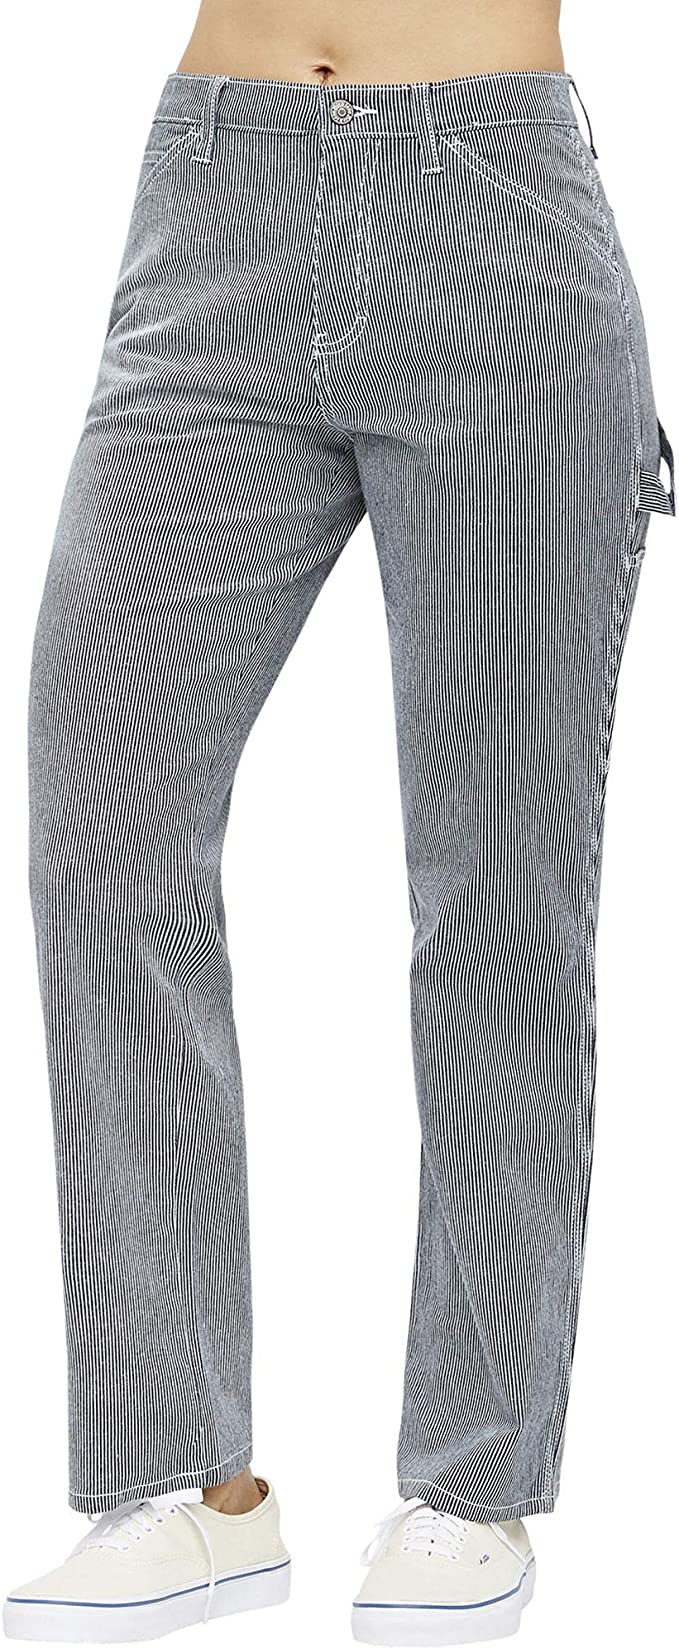 Navy//White 11 Dickies Girl Carpenter Pant Striped